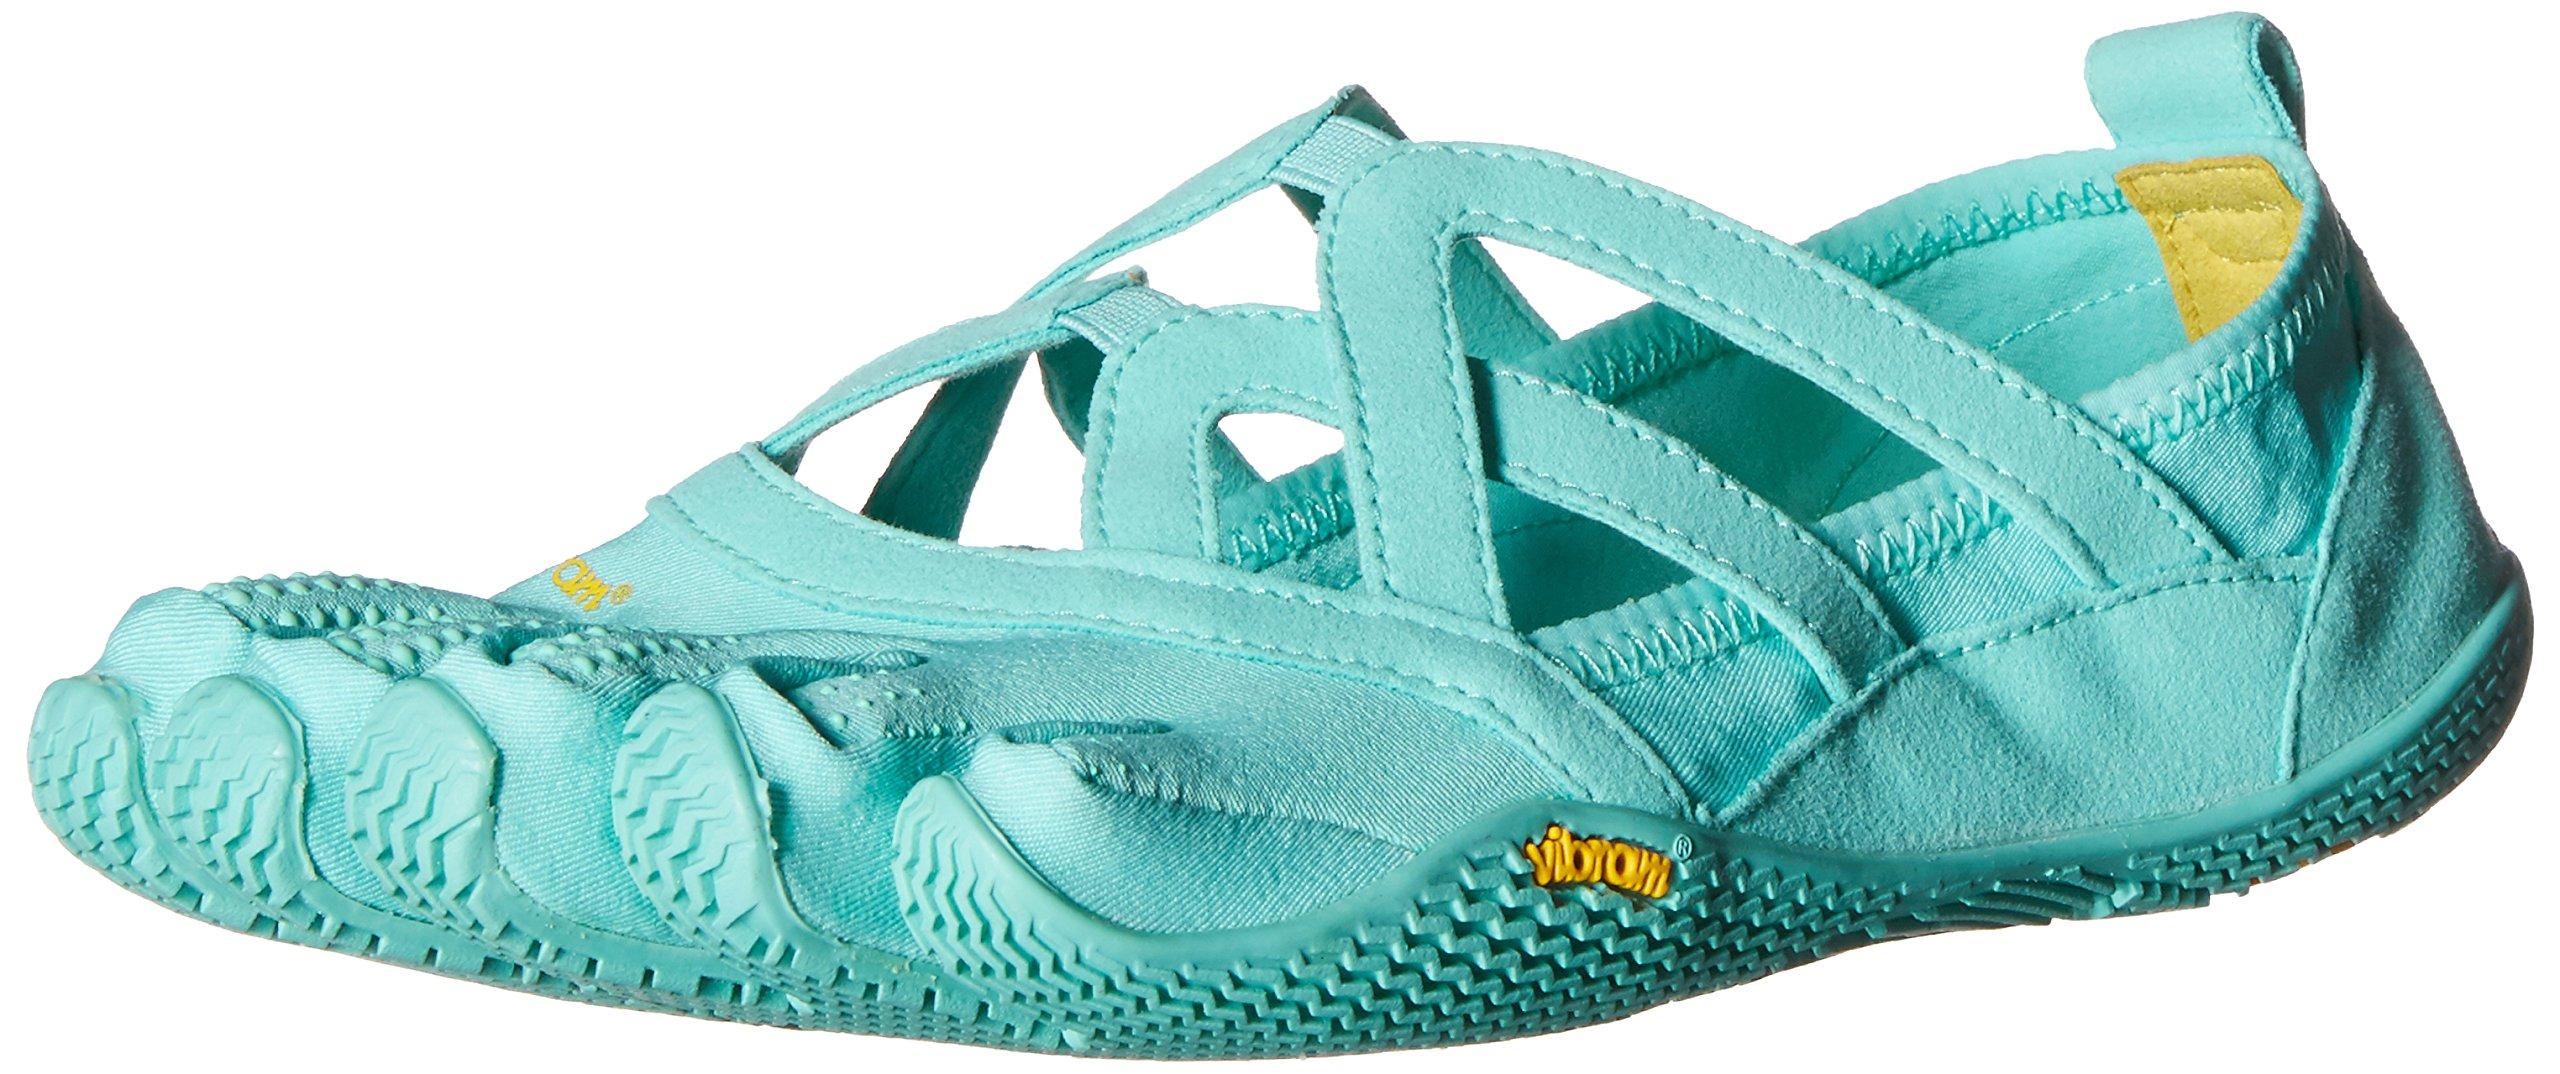 Vibram Women's Alitza Loop Fitness and Yoga Shoe, Mint, 38 EU/6.5-7 M US